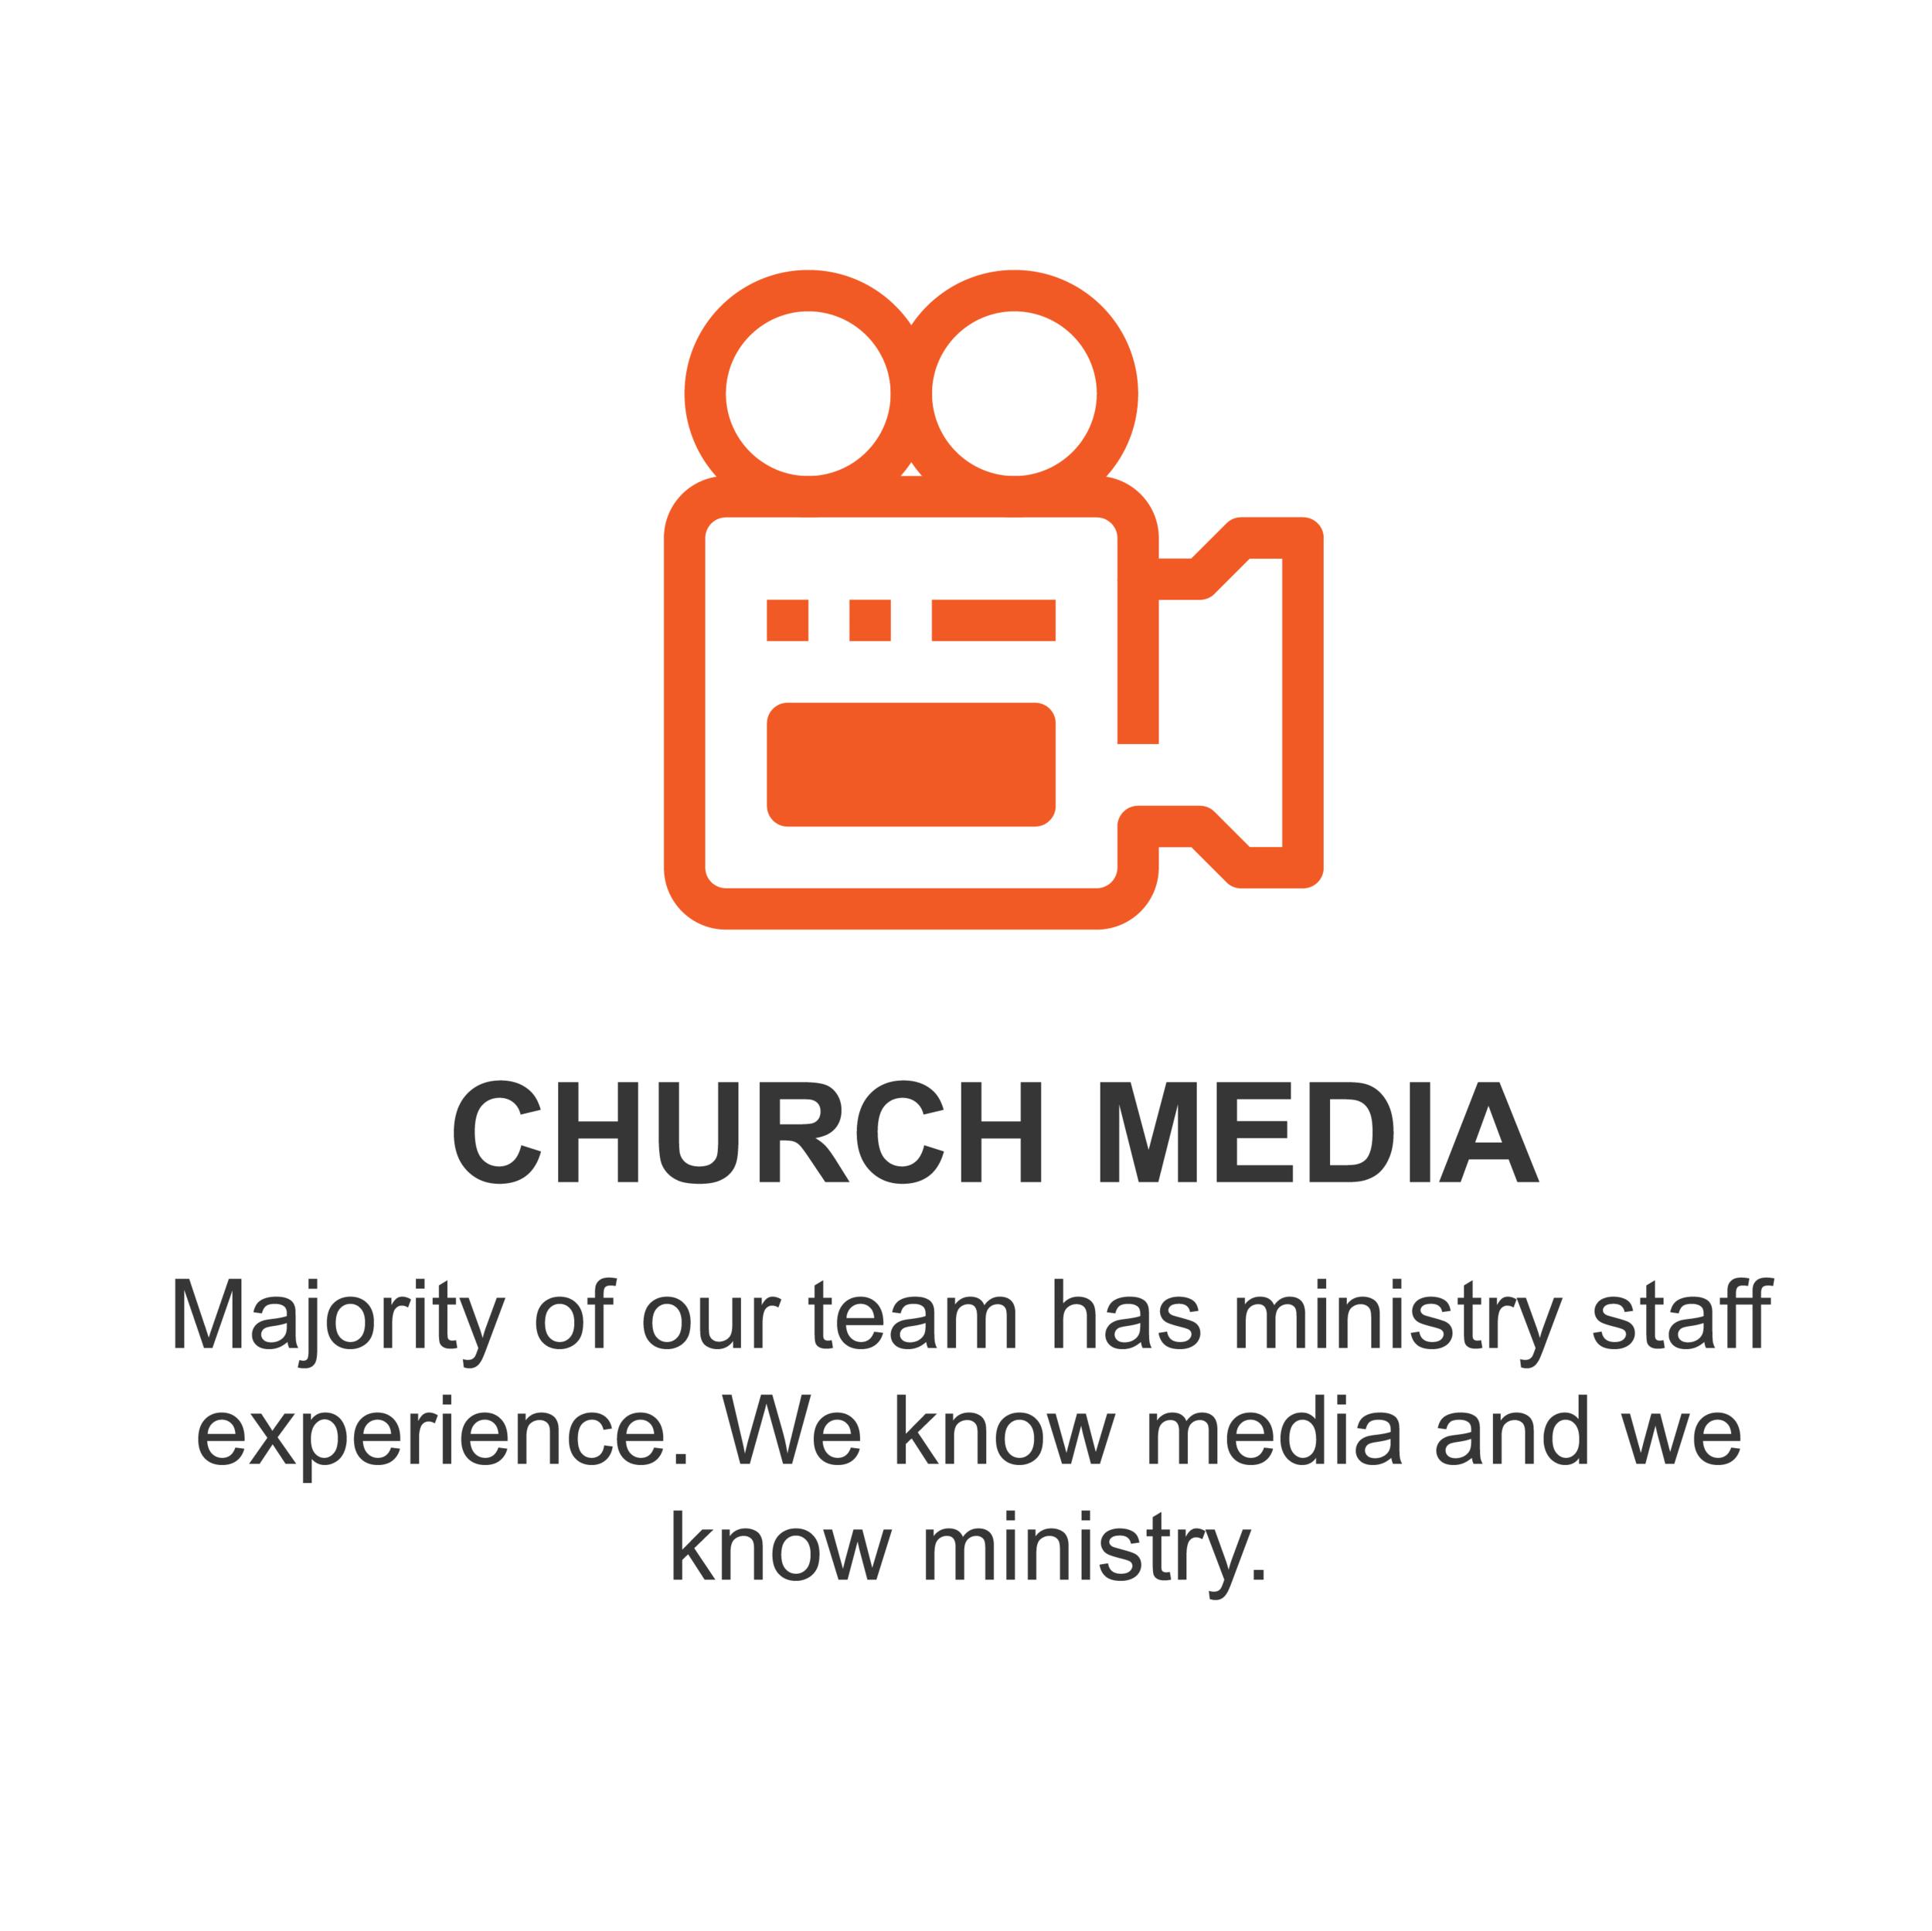 Churchmediaicon1.png